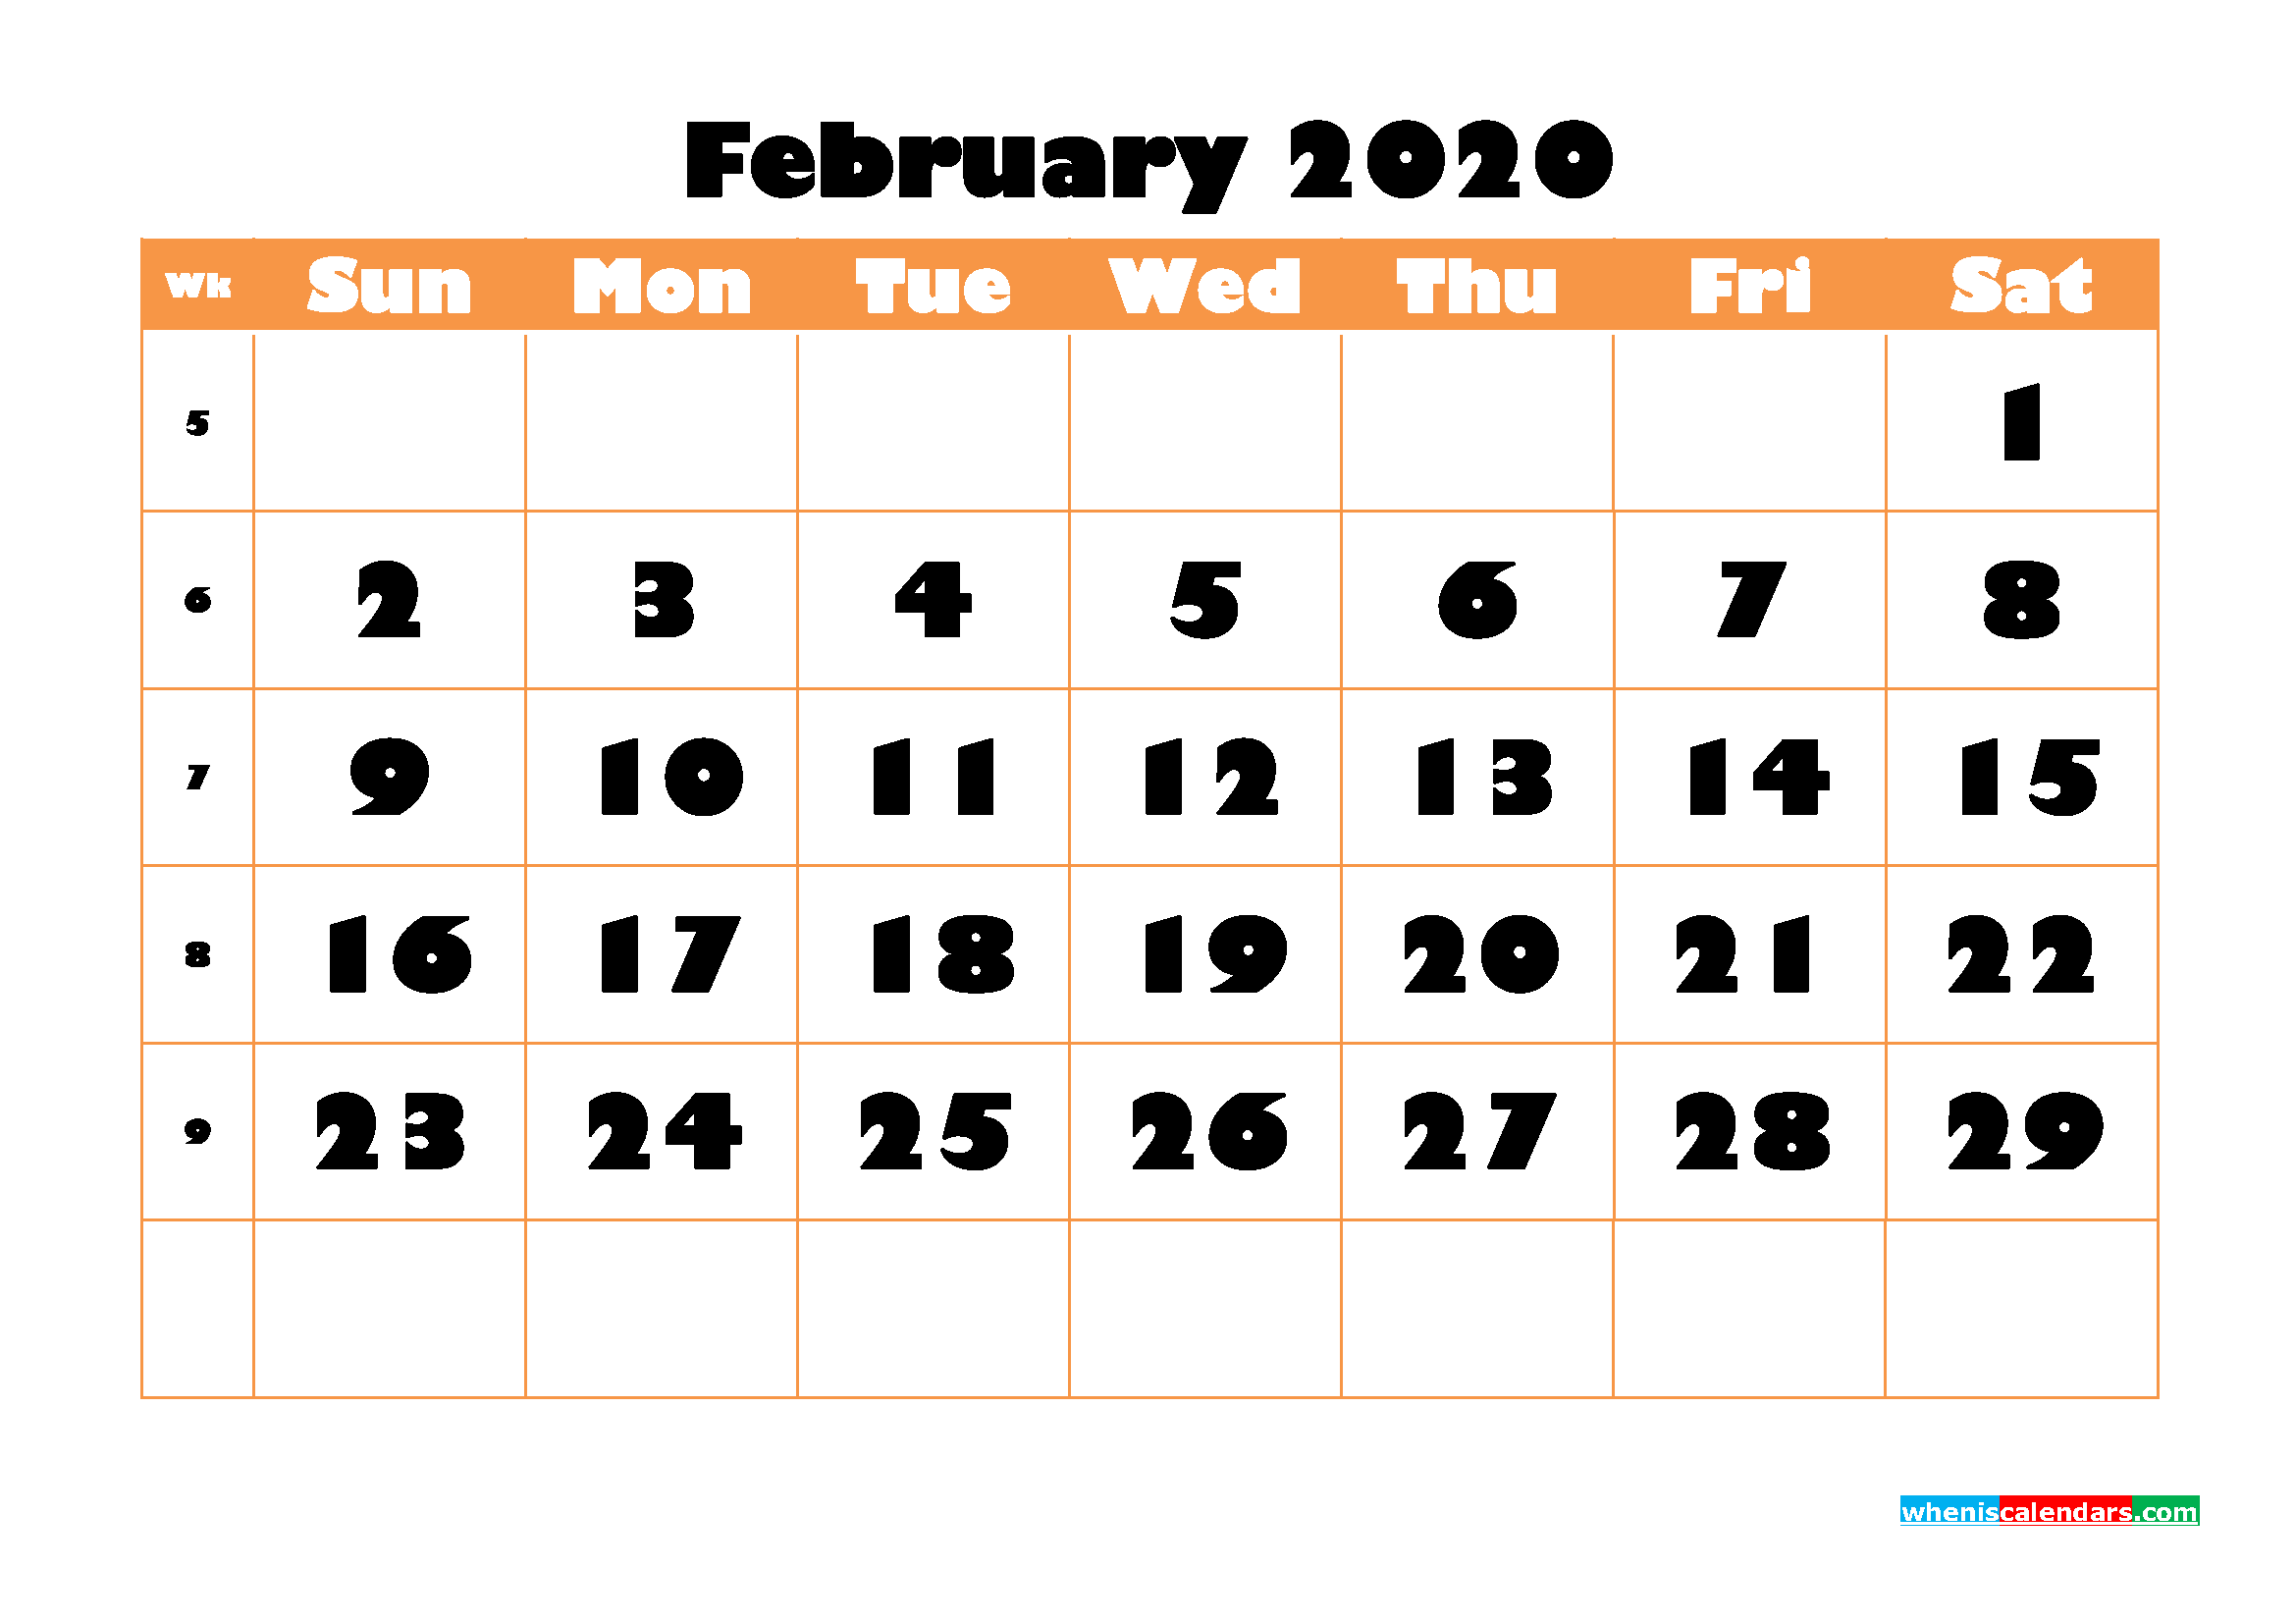 Blank February 2020 Calendar Printable - No.m20b770